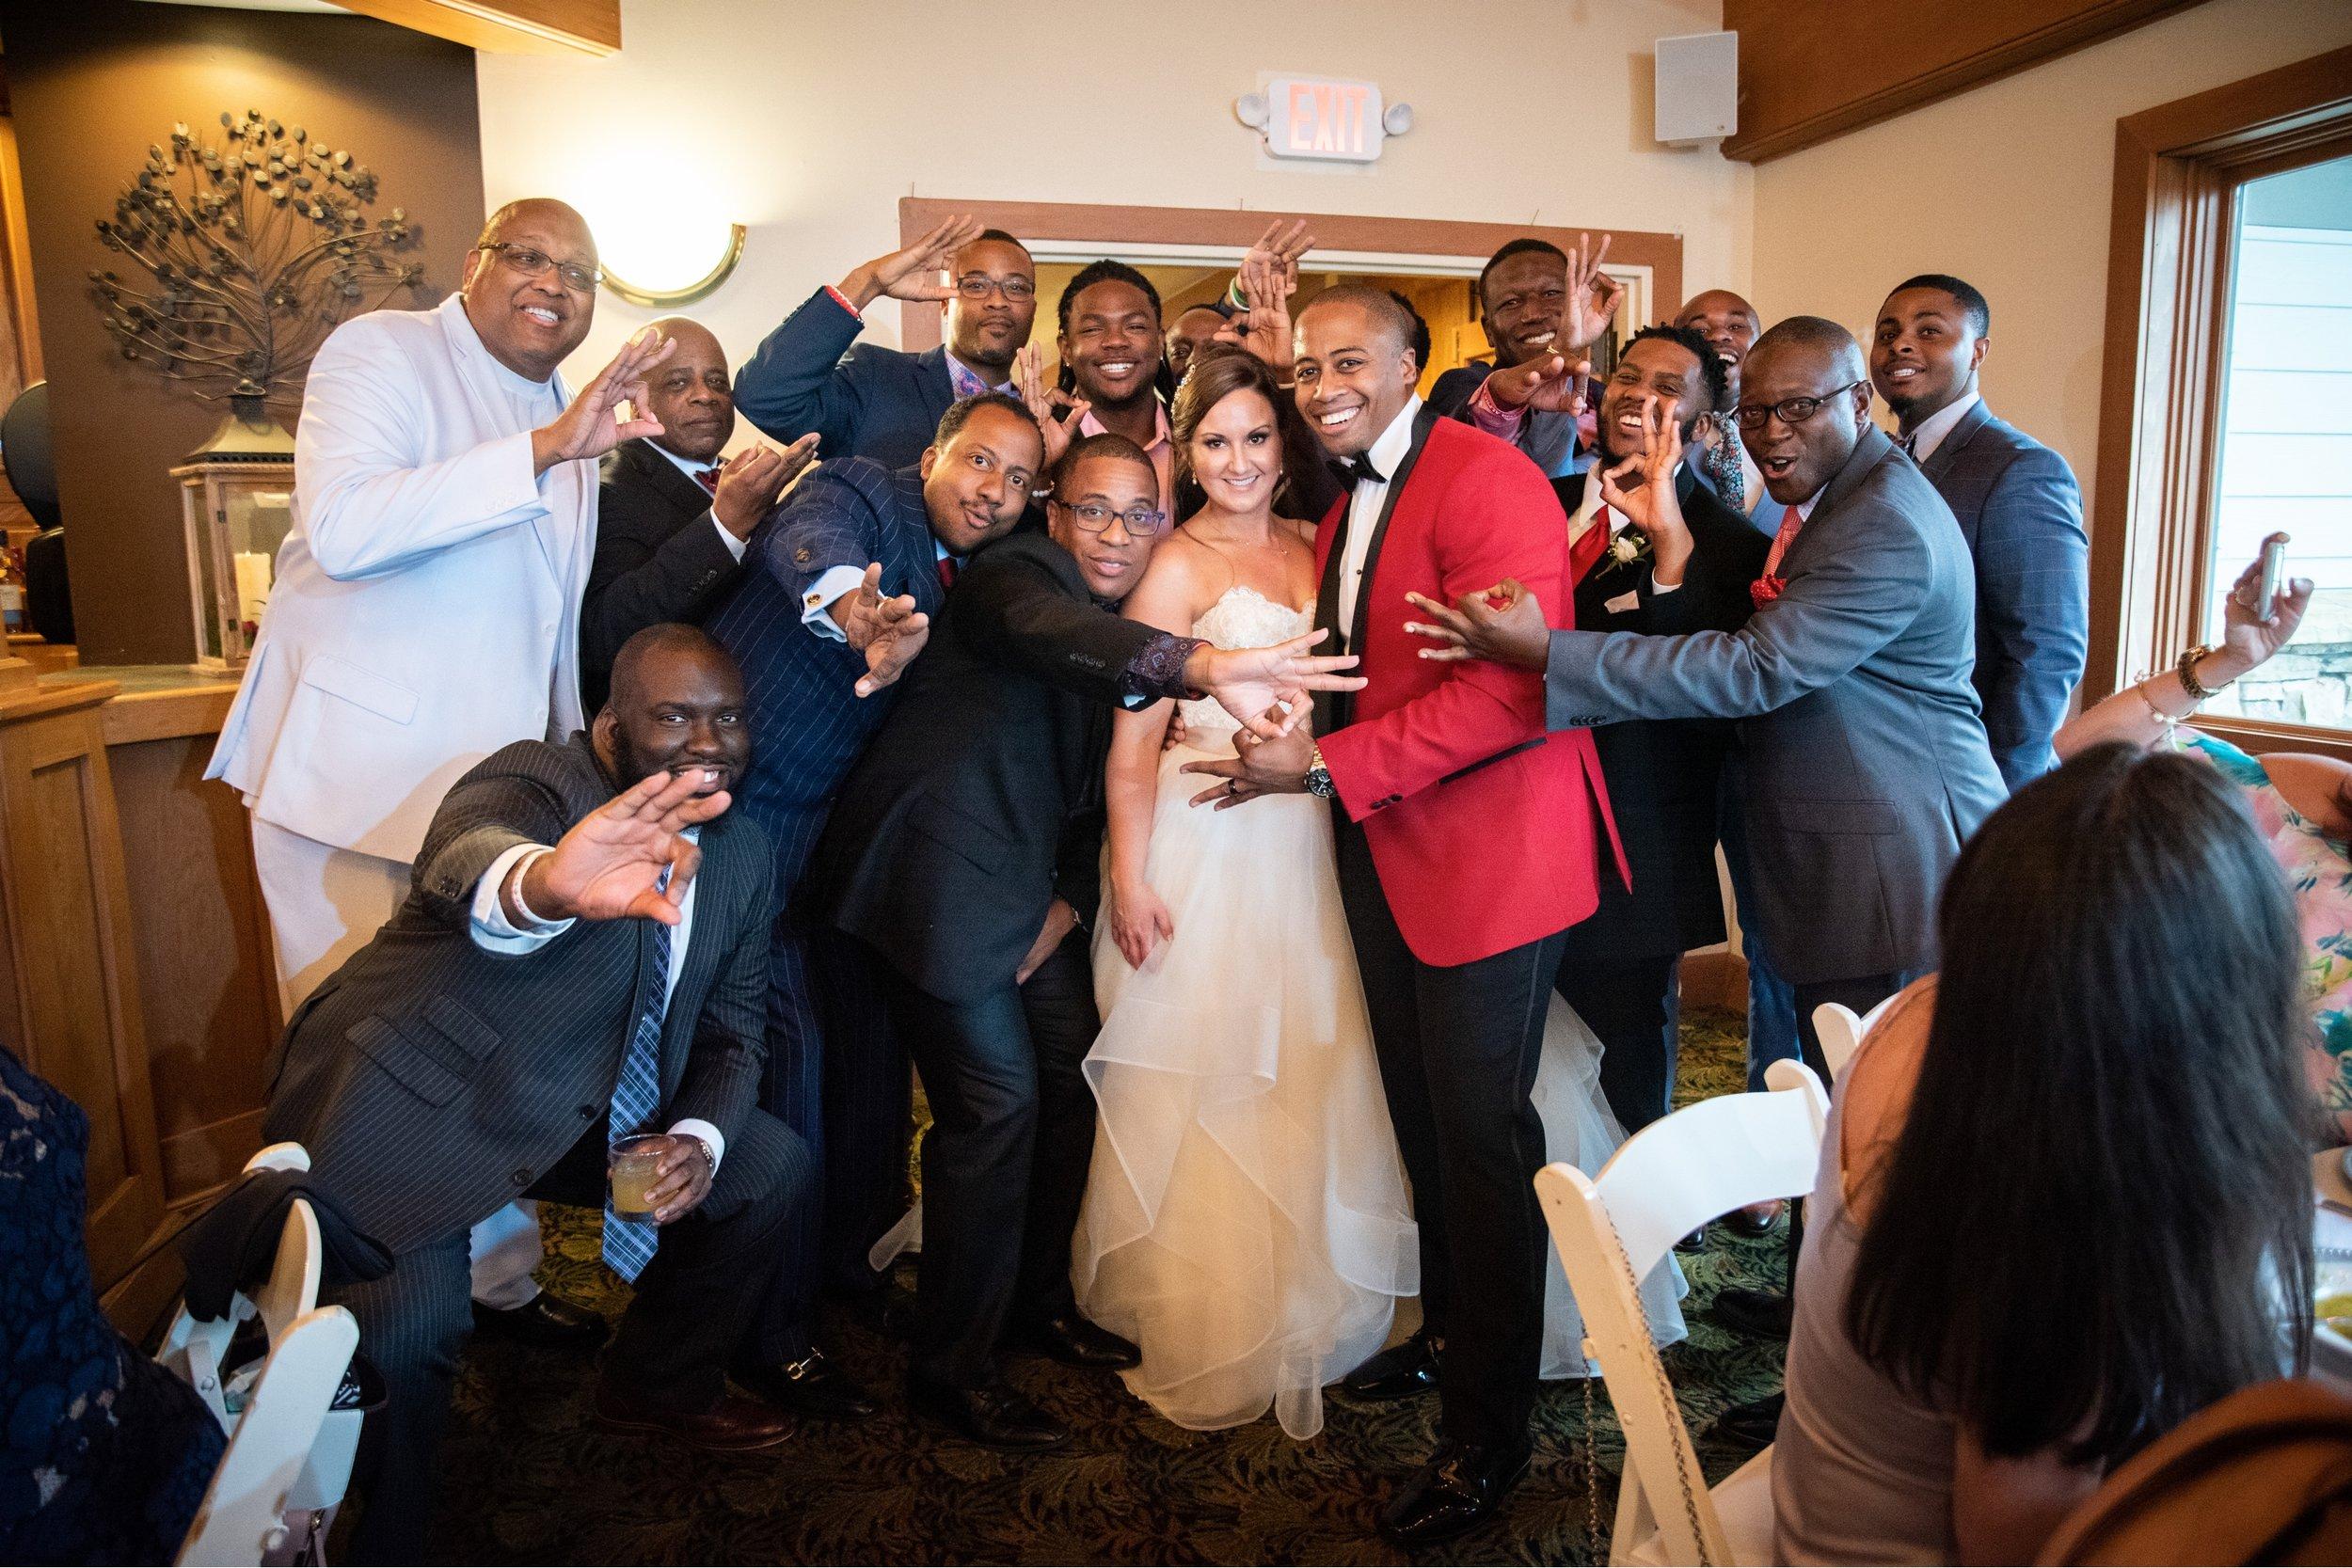 High Vista Weddings - Asheville Vendors 3 12.jpg